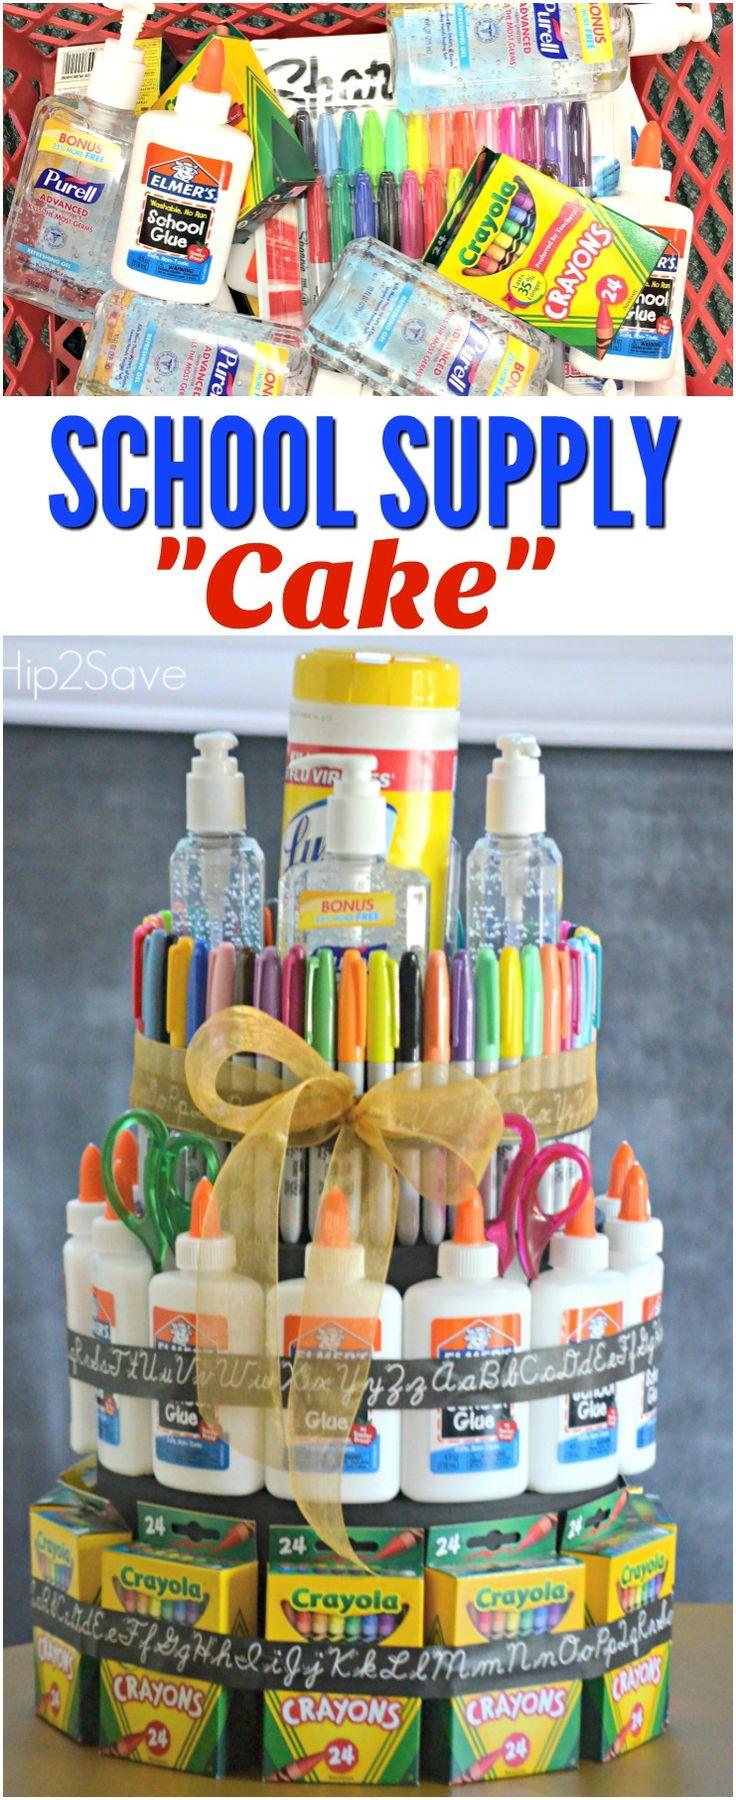 "School Supply ""Cake"" (Back to School Gift Idea)"